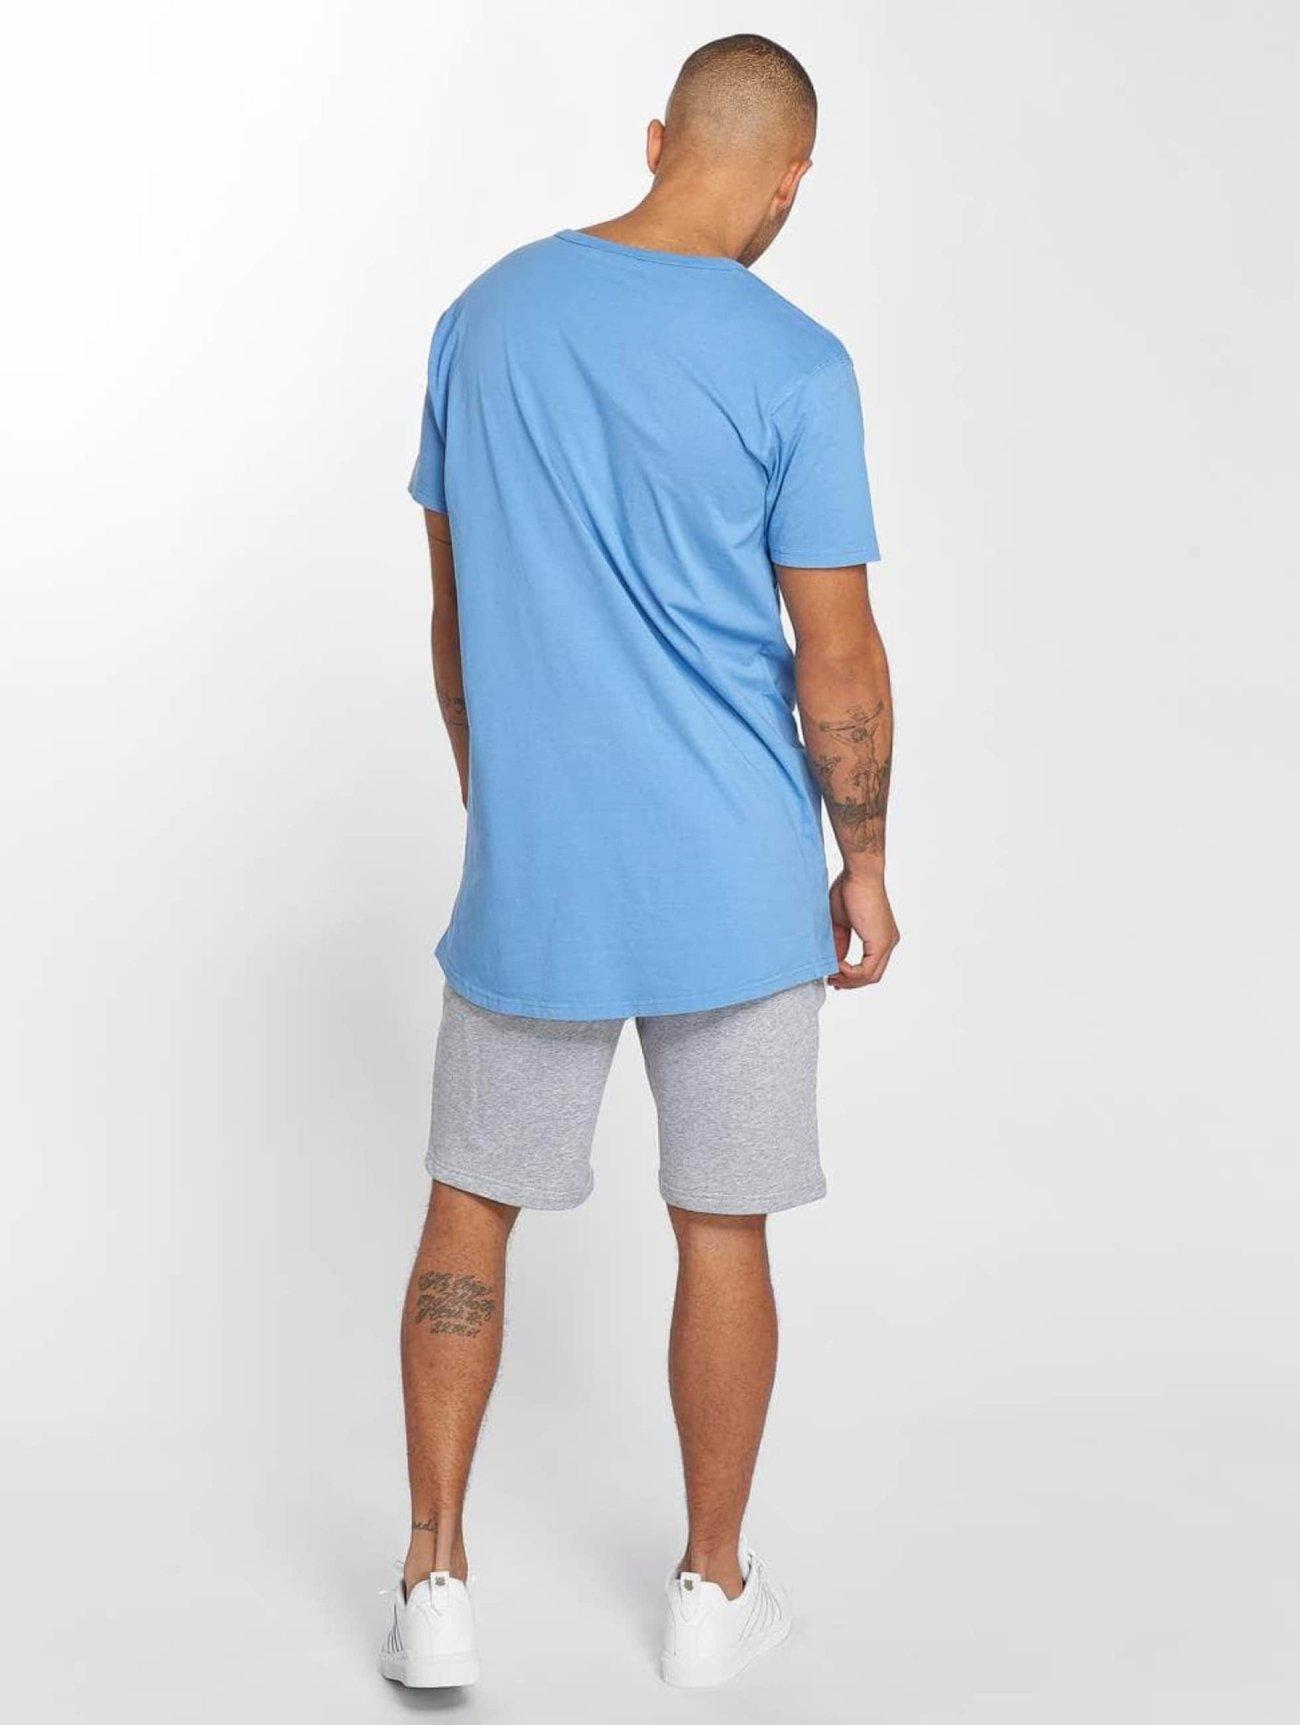 Urban Classics   Garment bleu Homme T-Shirt 476189  Homme Hauts